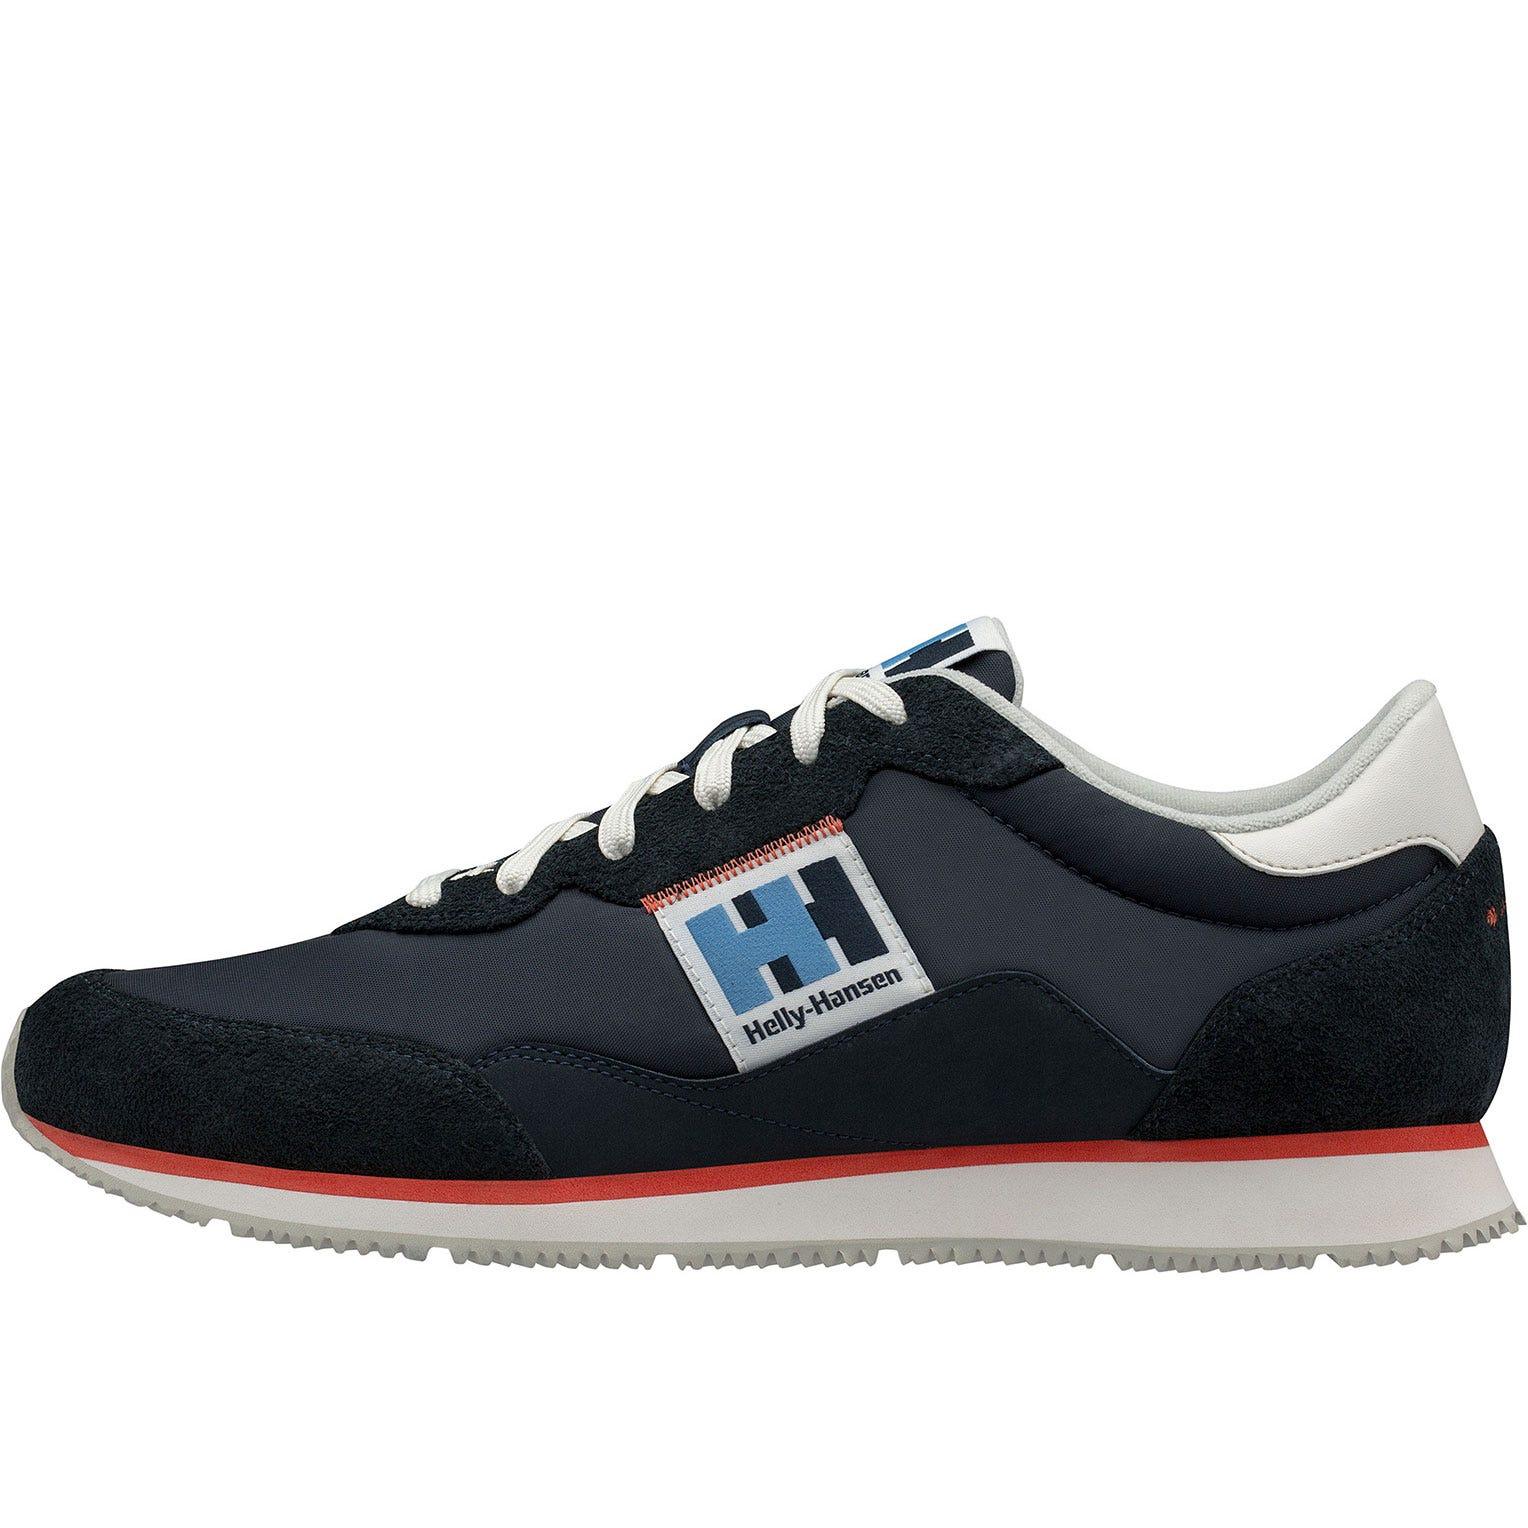 Helly Hansen Mens Ripples Nautical Low-cut Sneakers Navy 7.5